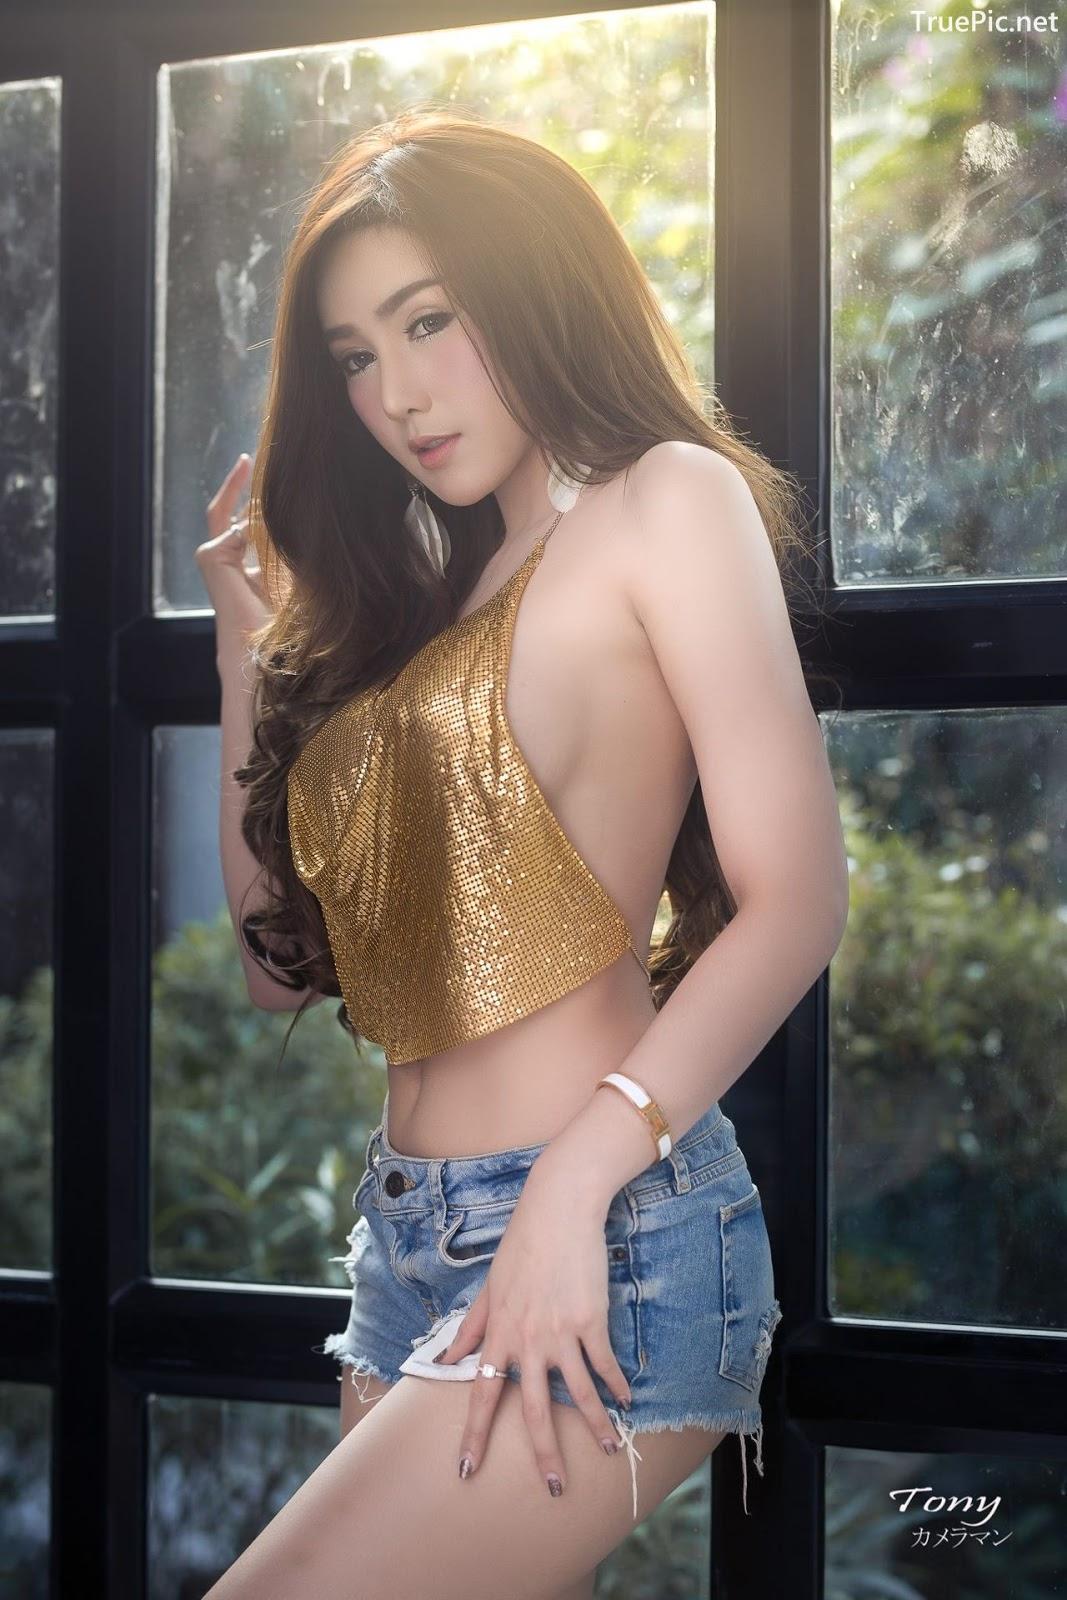 Image-Thailand-Sexy-Model-Khwankanang-Buakongyossawan-Yellow-Camisole-And-Jean-TruePic.net- Picture-1